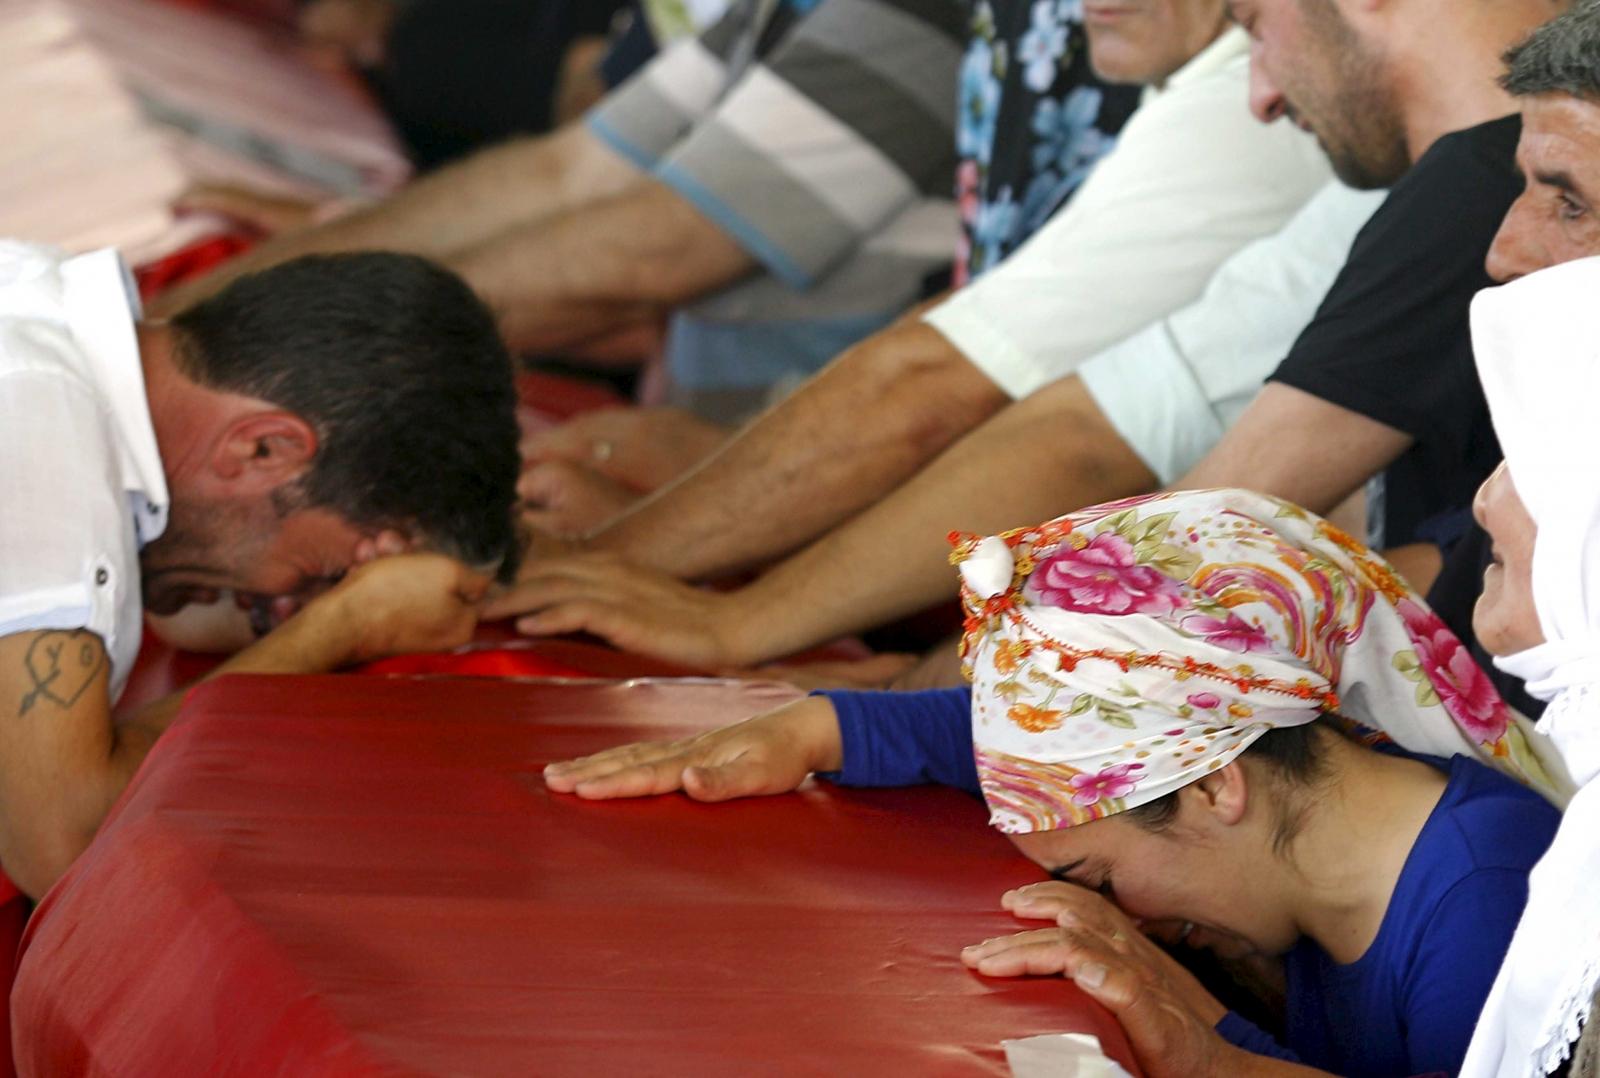 Suruc suicide bombing